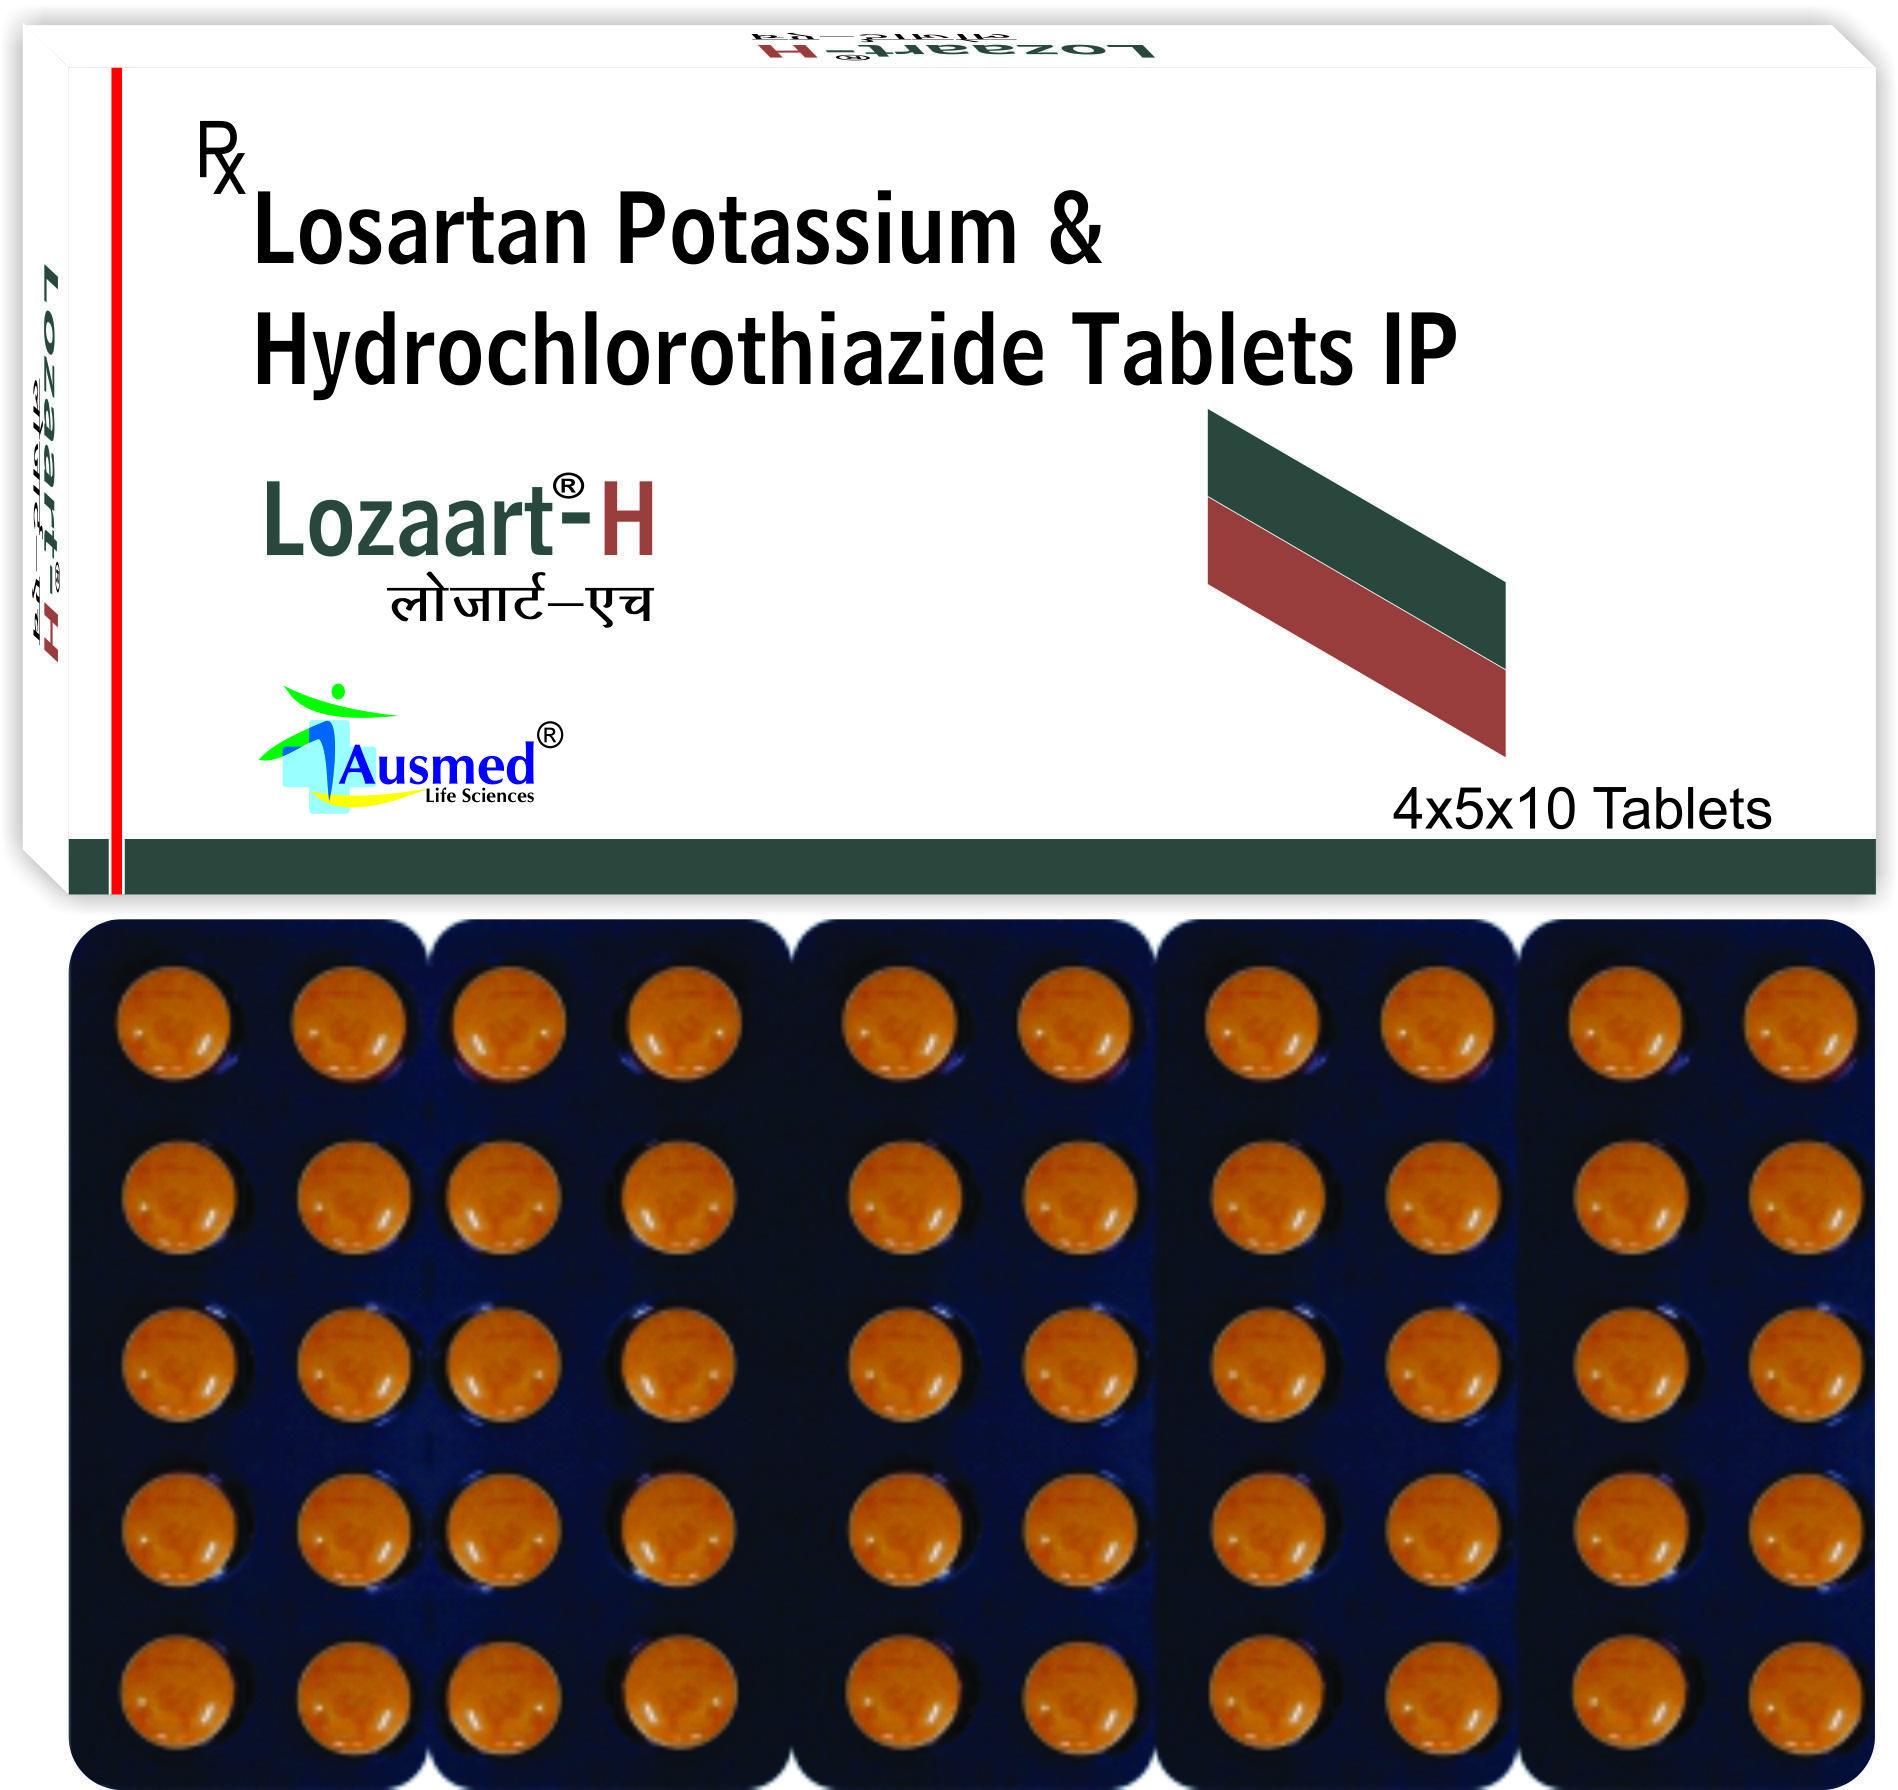 Losartan Potassium  Ip 50mg. +  Amlodipine Besylate  Ip  5mg./lozaart